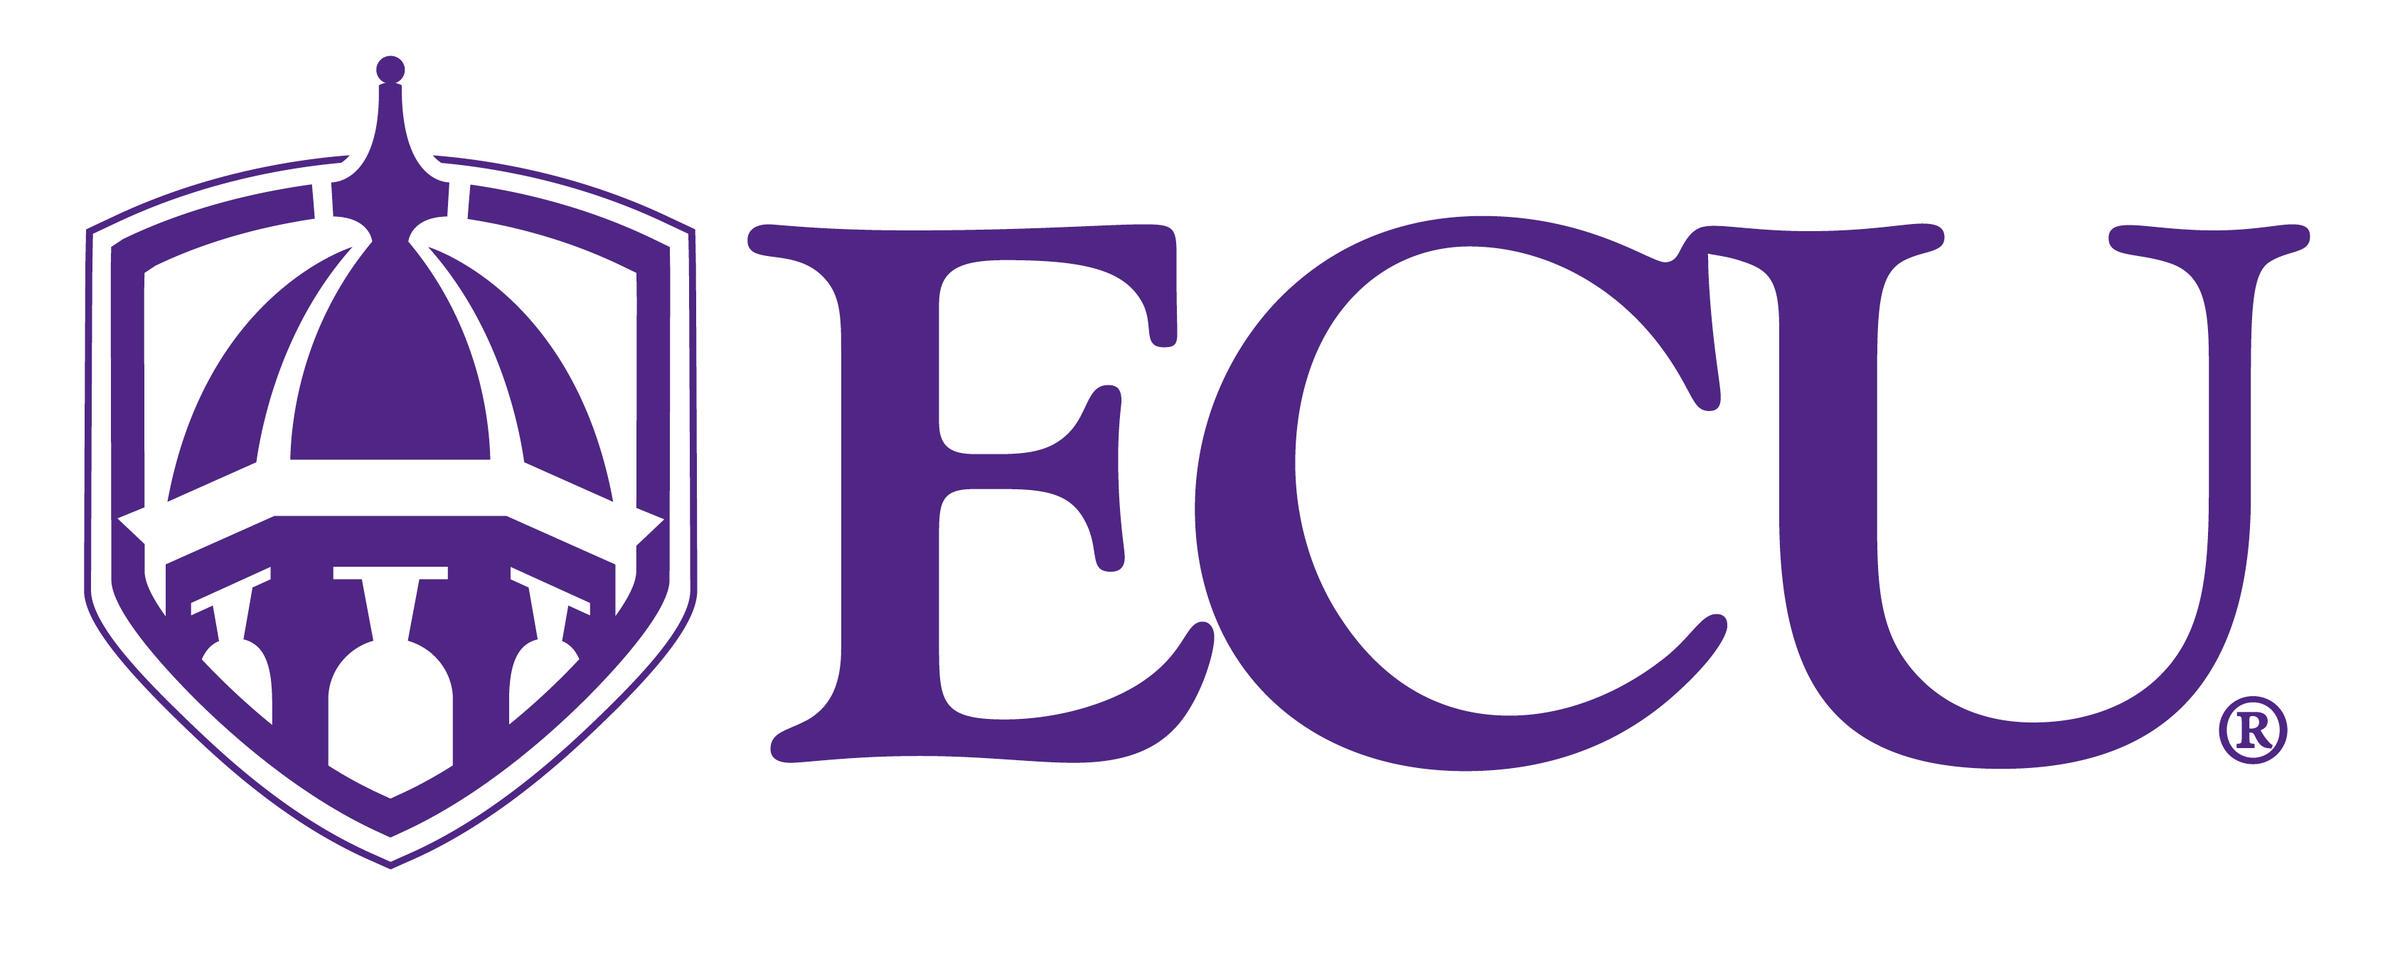 East Carolina University - Guest artist and choreographer for ECU's Senior dance majors